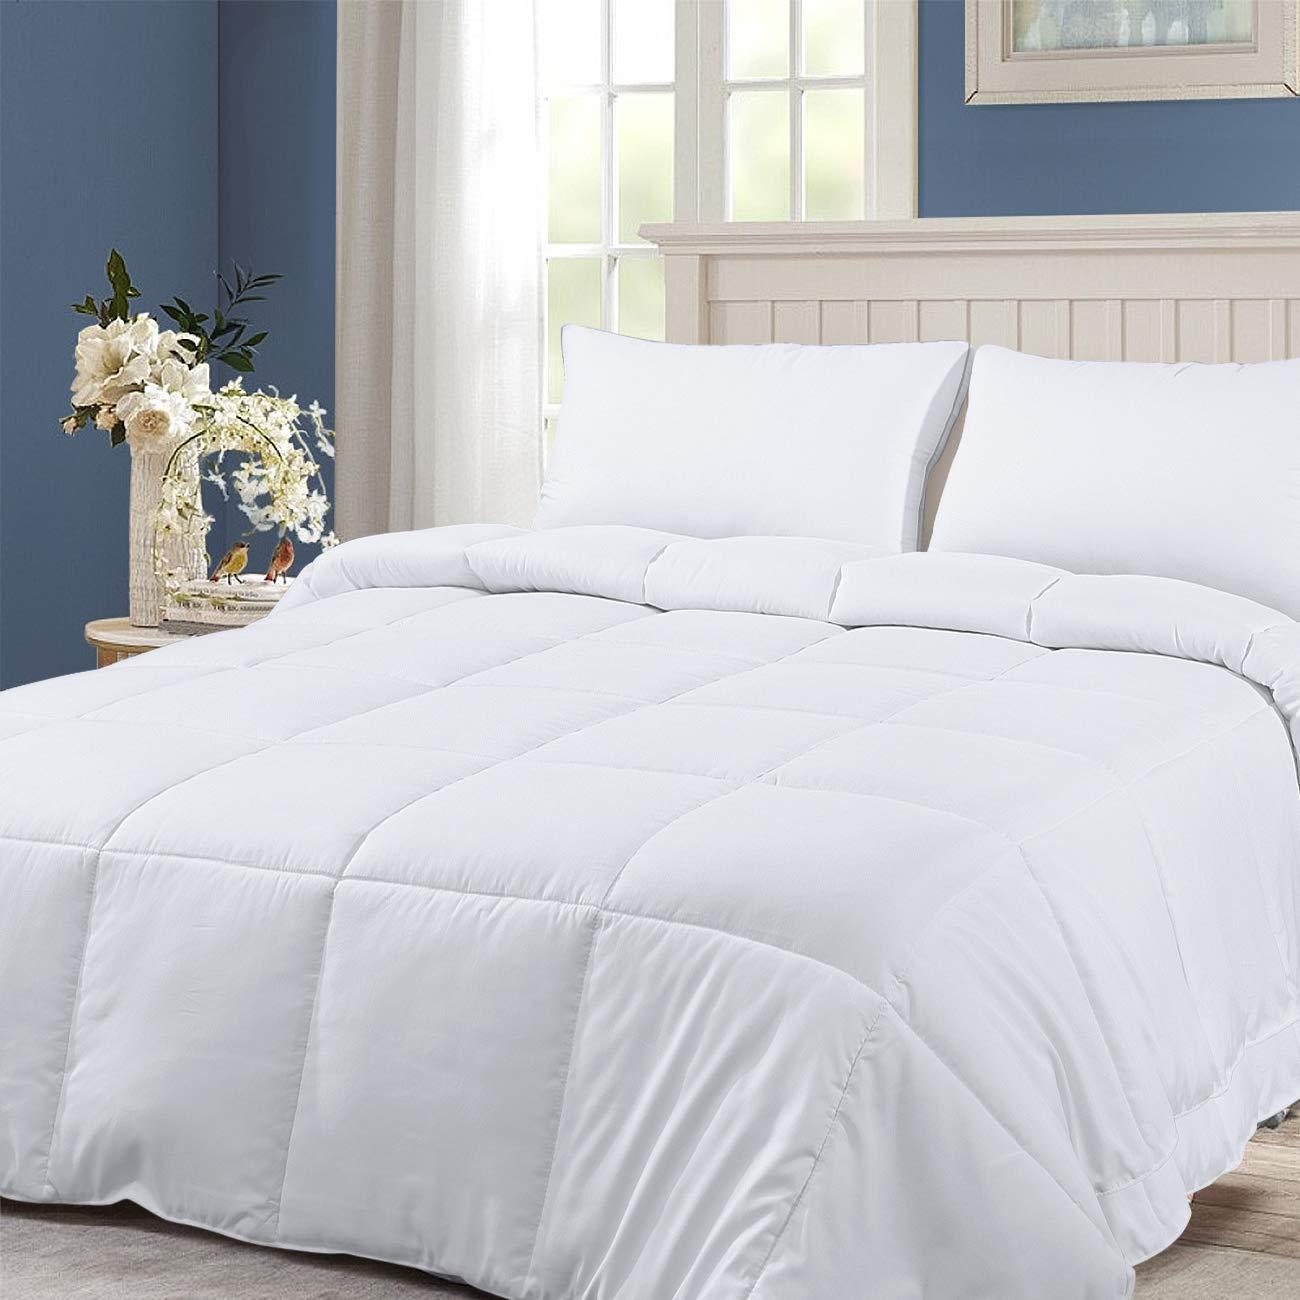 viewstar Summer Duvet Insert, Lightweight Bed Comforter, All-Season White Breathable Duvet Insert or Stand-Alone Comforter with Corner Duvet Tabs - Hypoallergenic - Machine Washable(Queen 88x88)